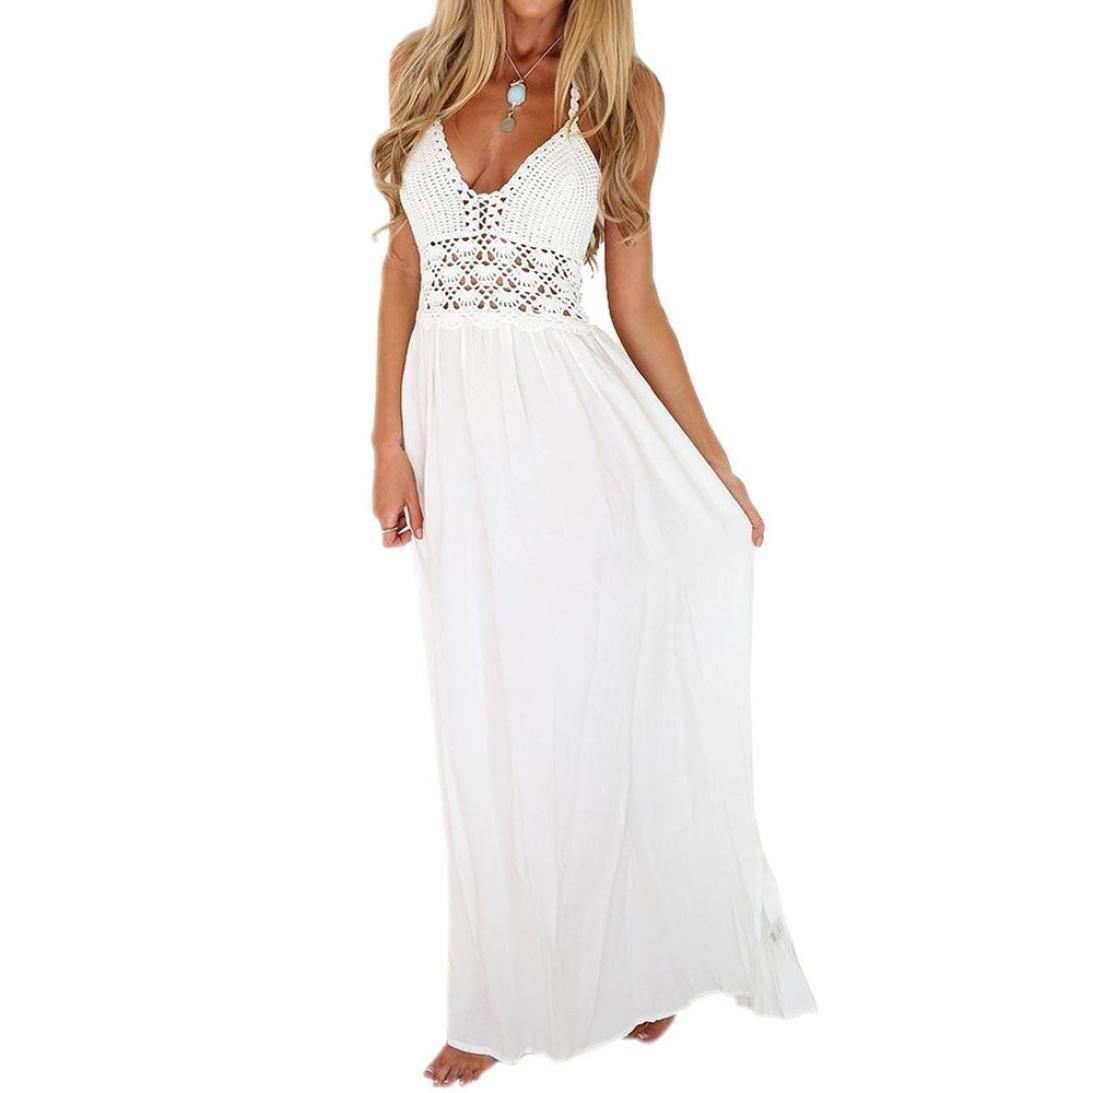 FUNIC Women's Crochet Backless Boho Style Halterneck Evening Party Maxi Long Dresses (S, White)